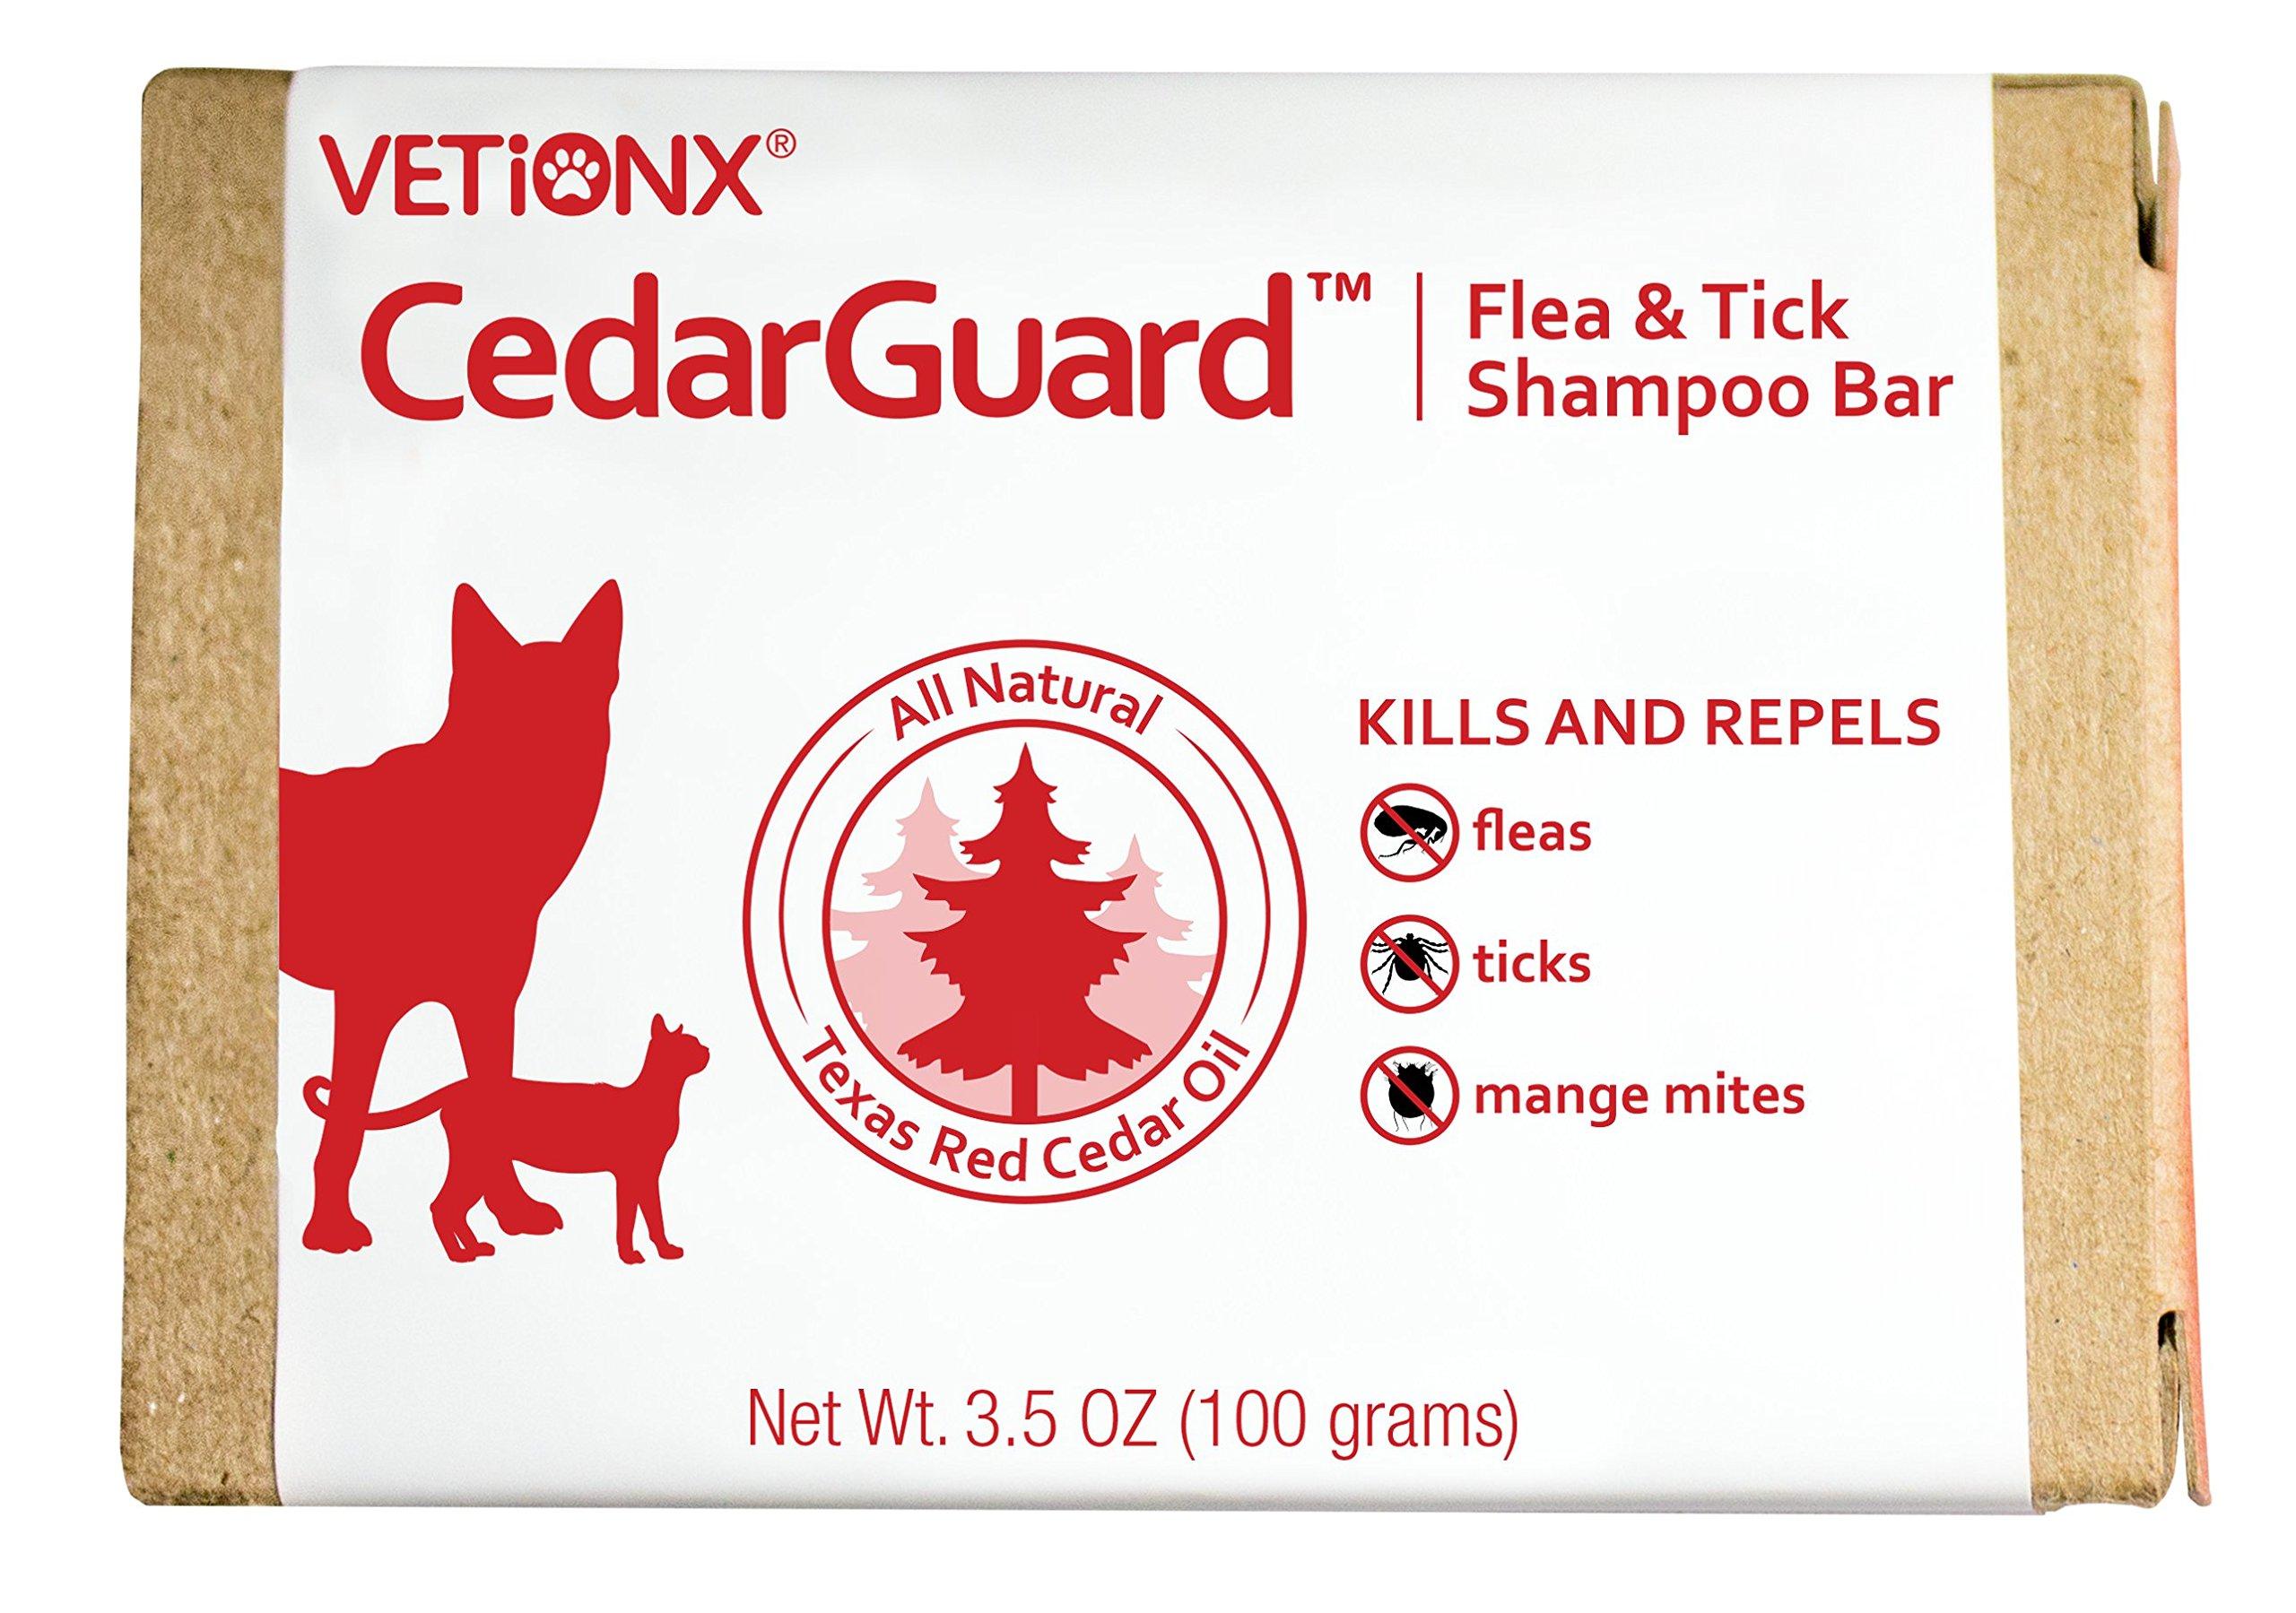 VETiONX CedarGuard Flea & Tick Shampoo Bar